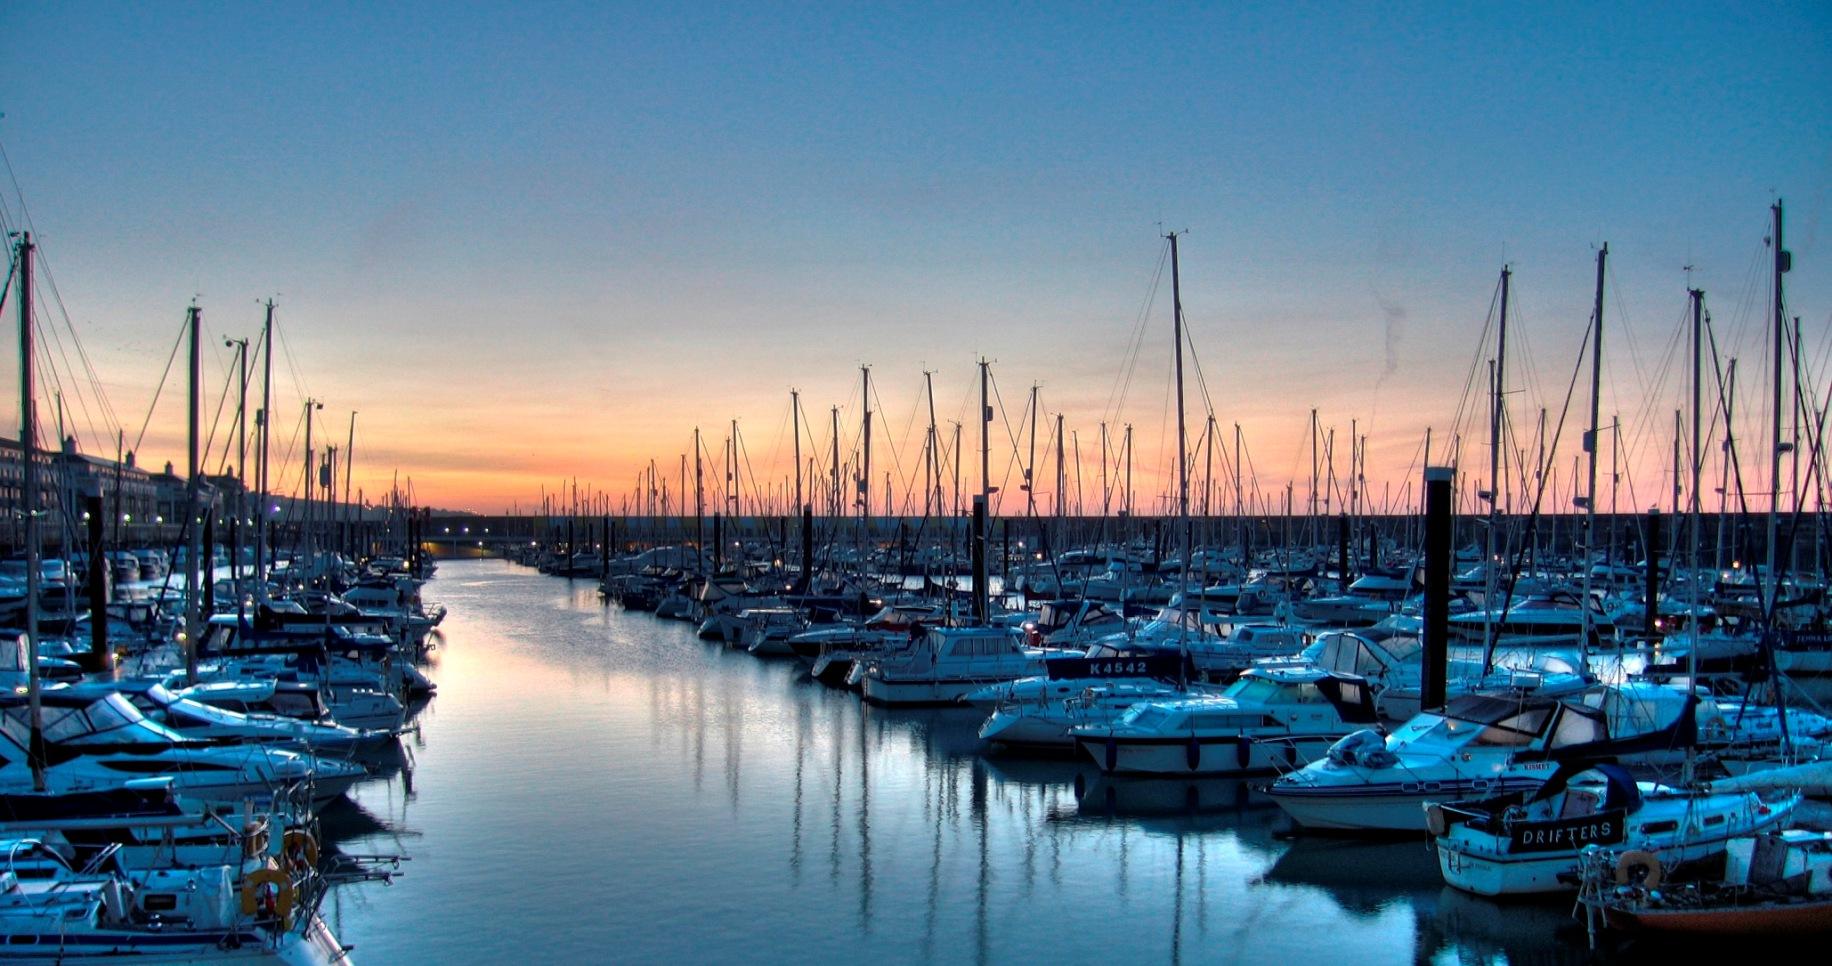 uk national marina berth survey mediterranean berths marinas